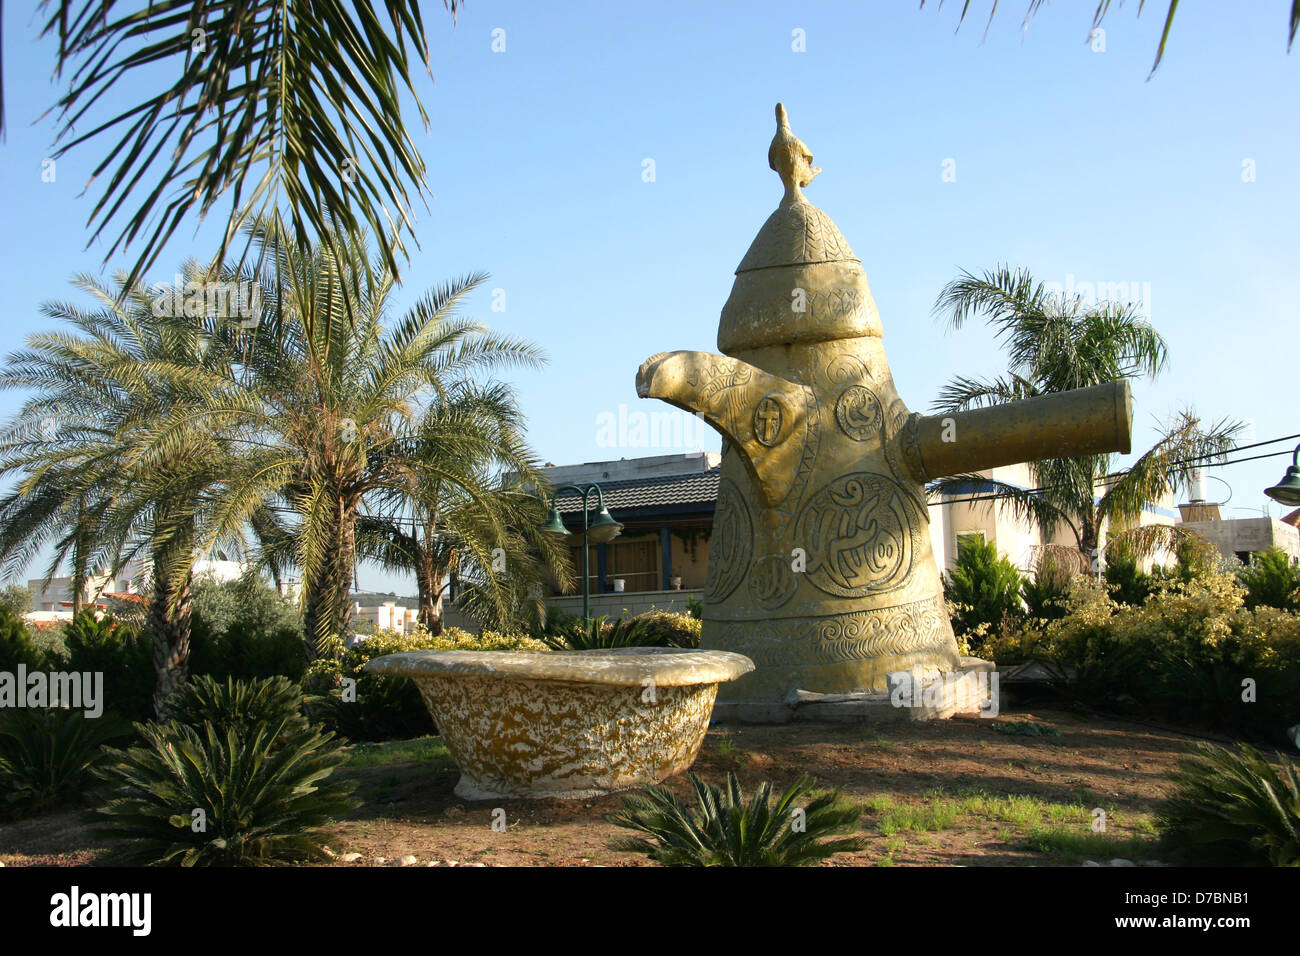 Escultura de una aldea Al-Maker finjan en Galilea. Foto de stock